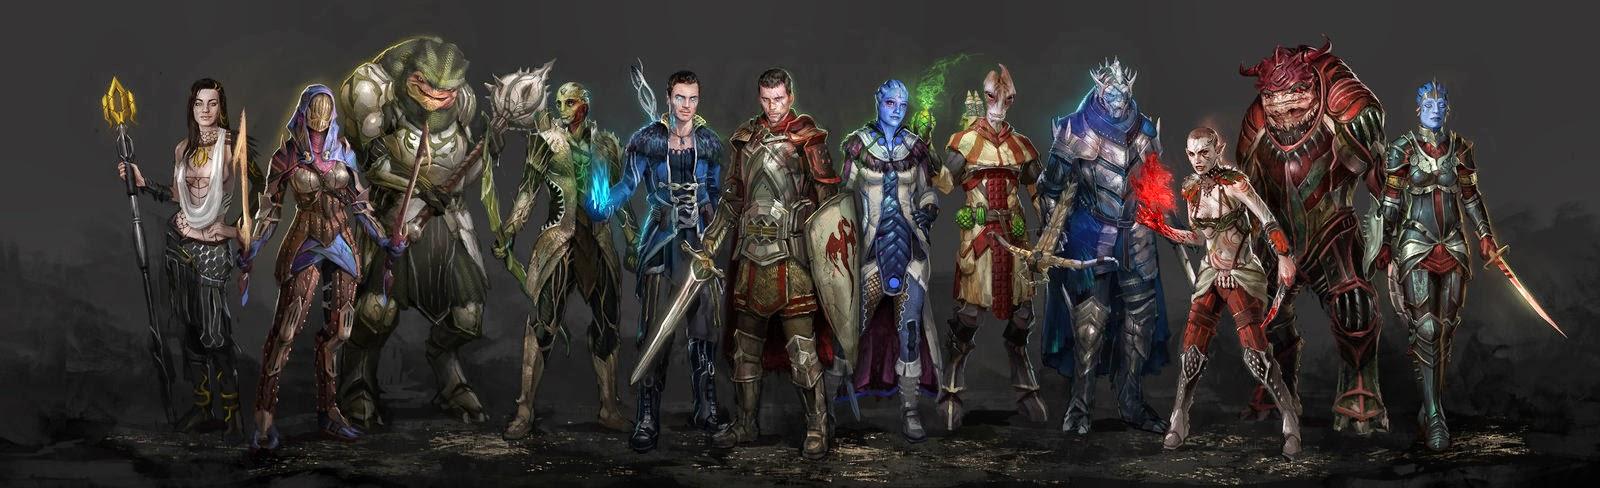 Dragon+Age+Inquisition-+Multiple+Voice+A